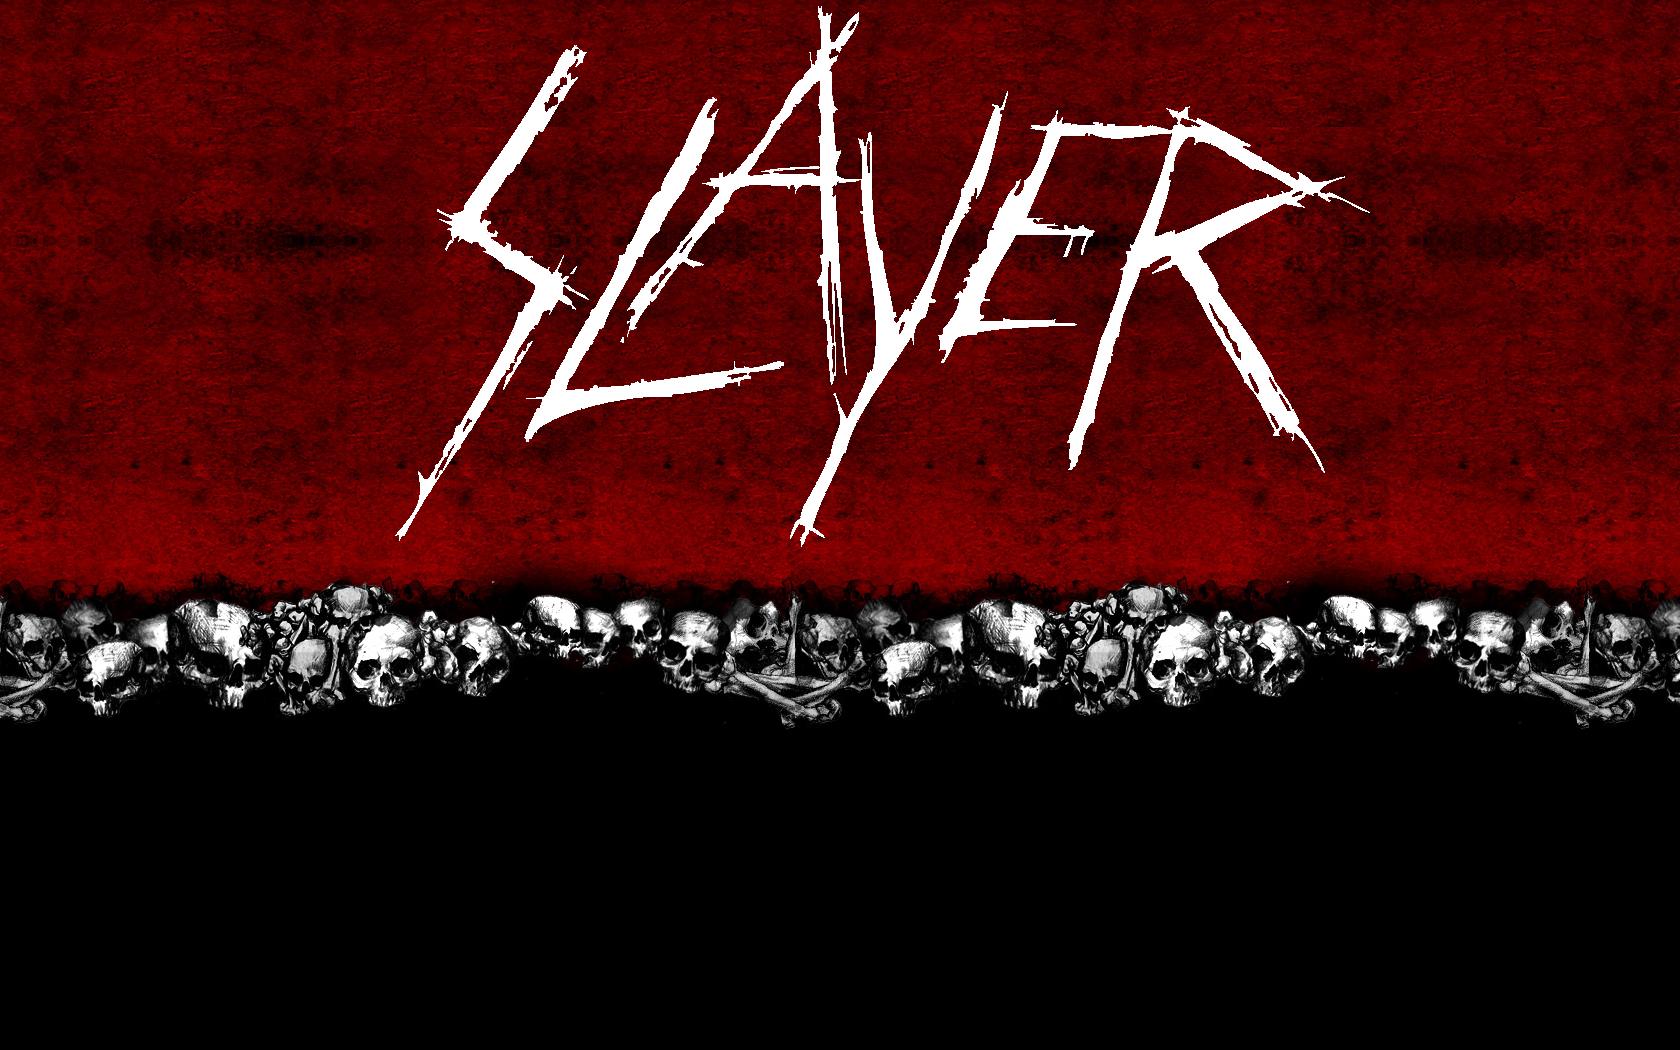 Slayer Wallpaper 1680x1050 Slayer 1680x1050